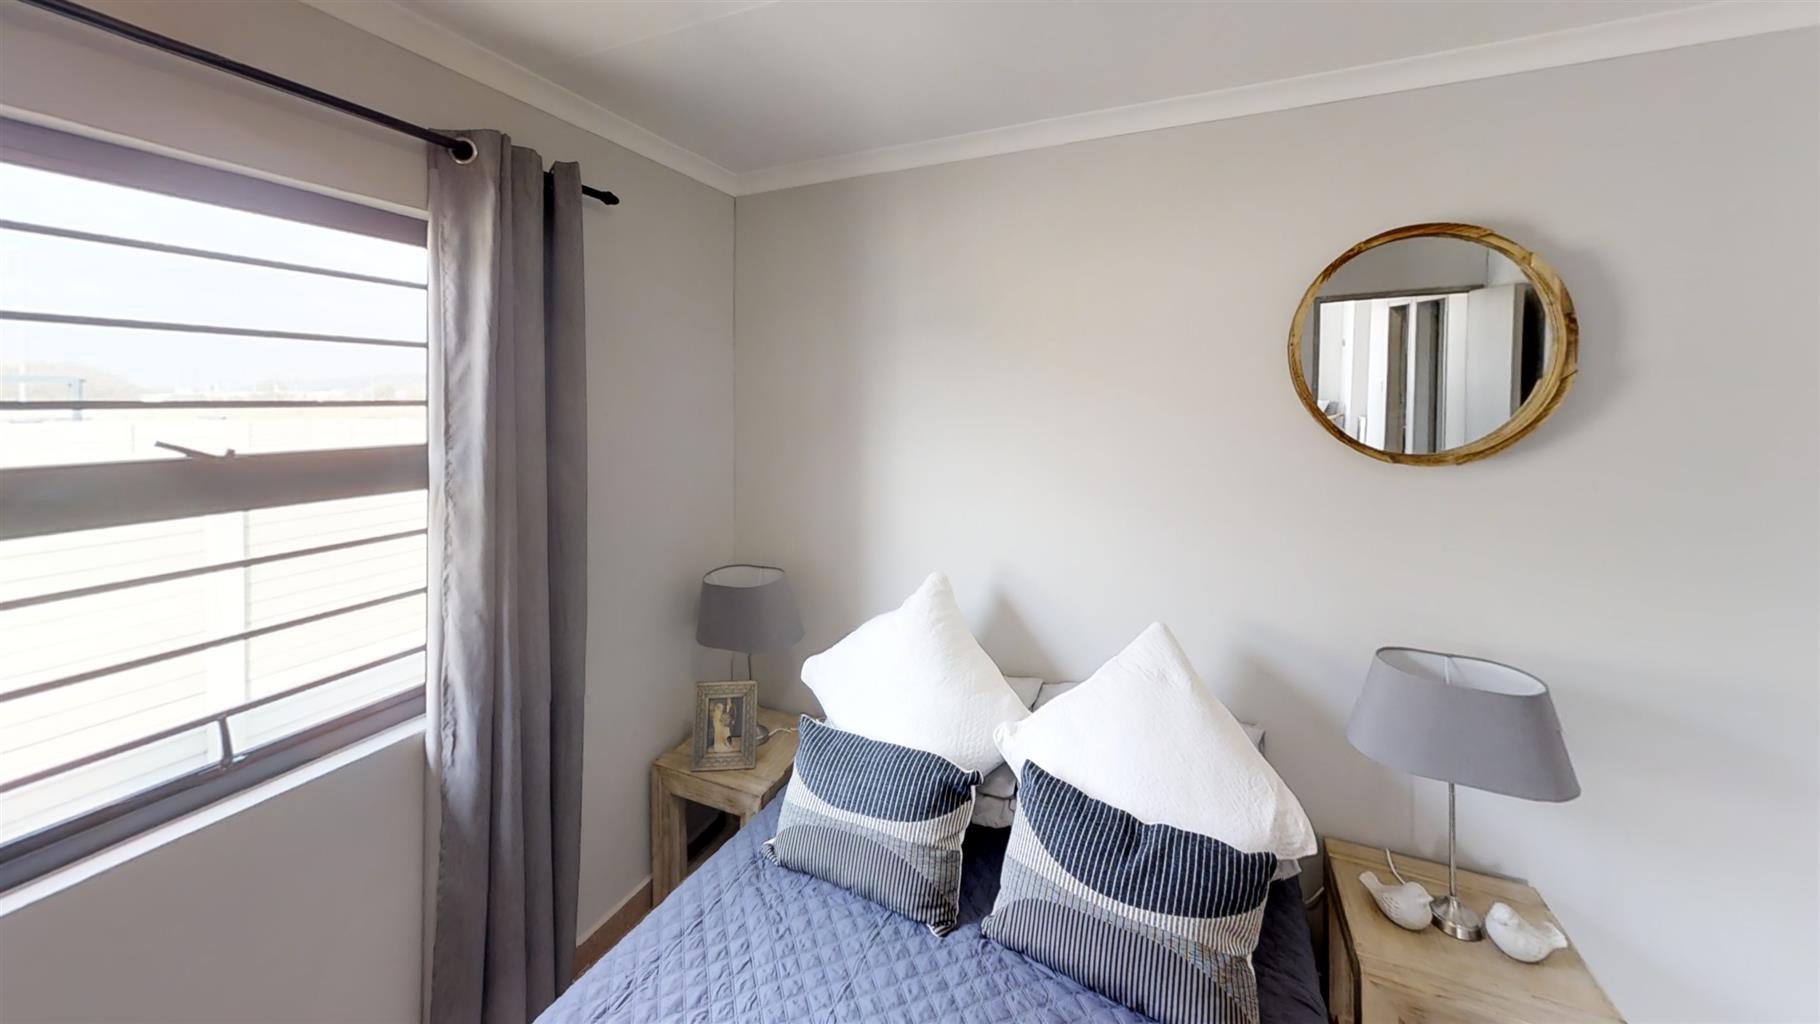 Pretoria West houses on sale